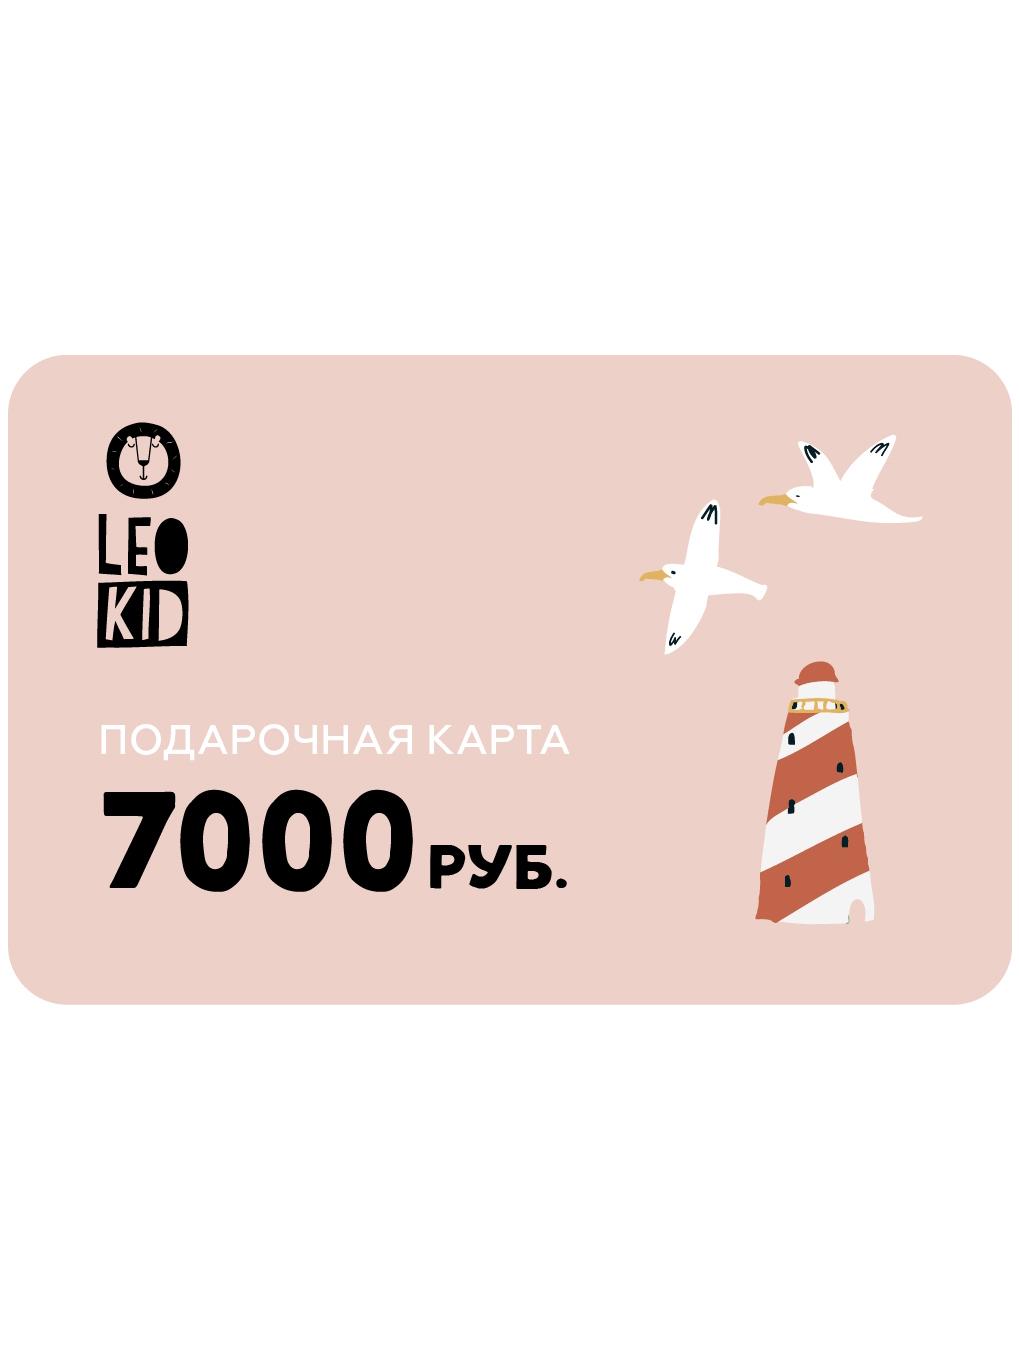 Электронная подарочная карта 7000